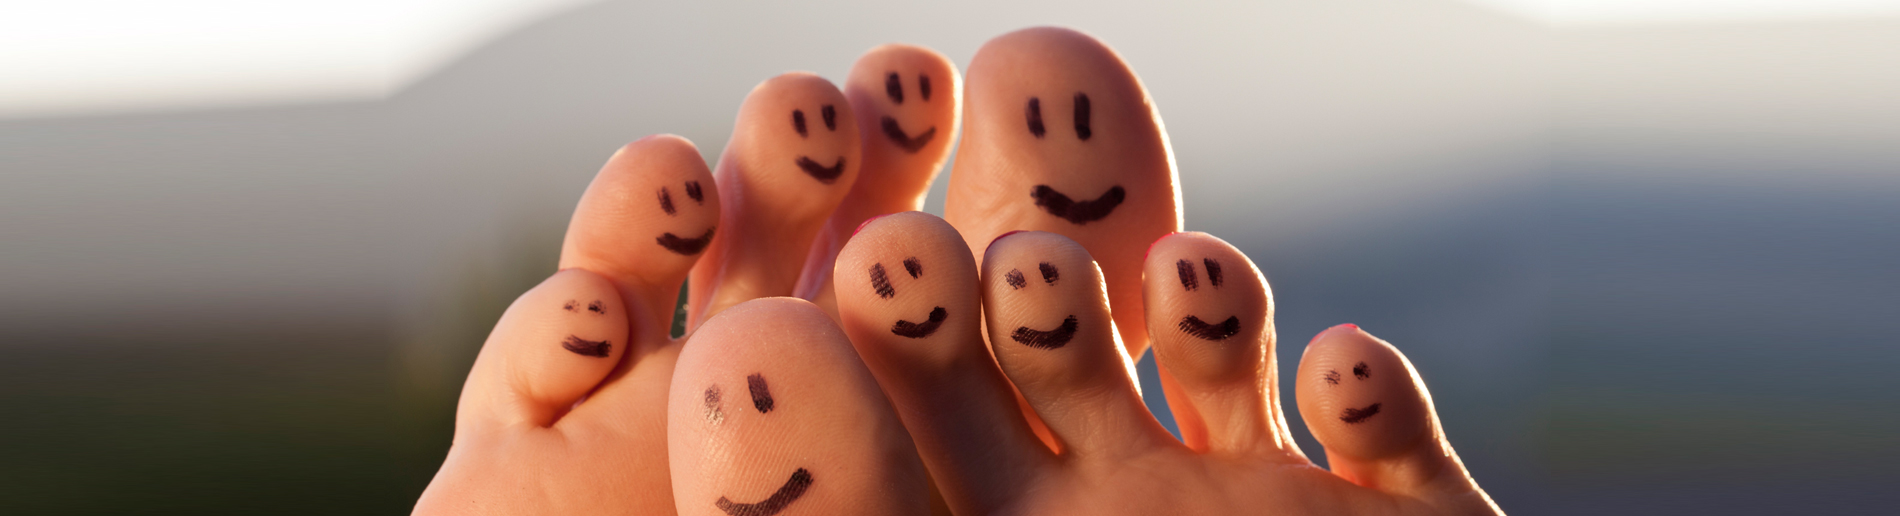 Diabetes Foot Care Centres in Mumbai